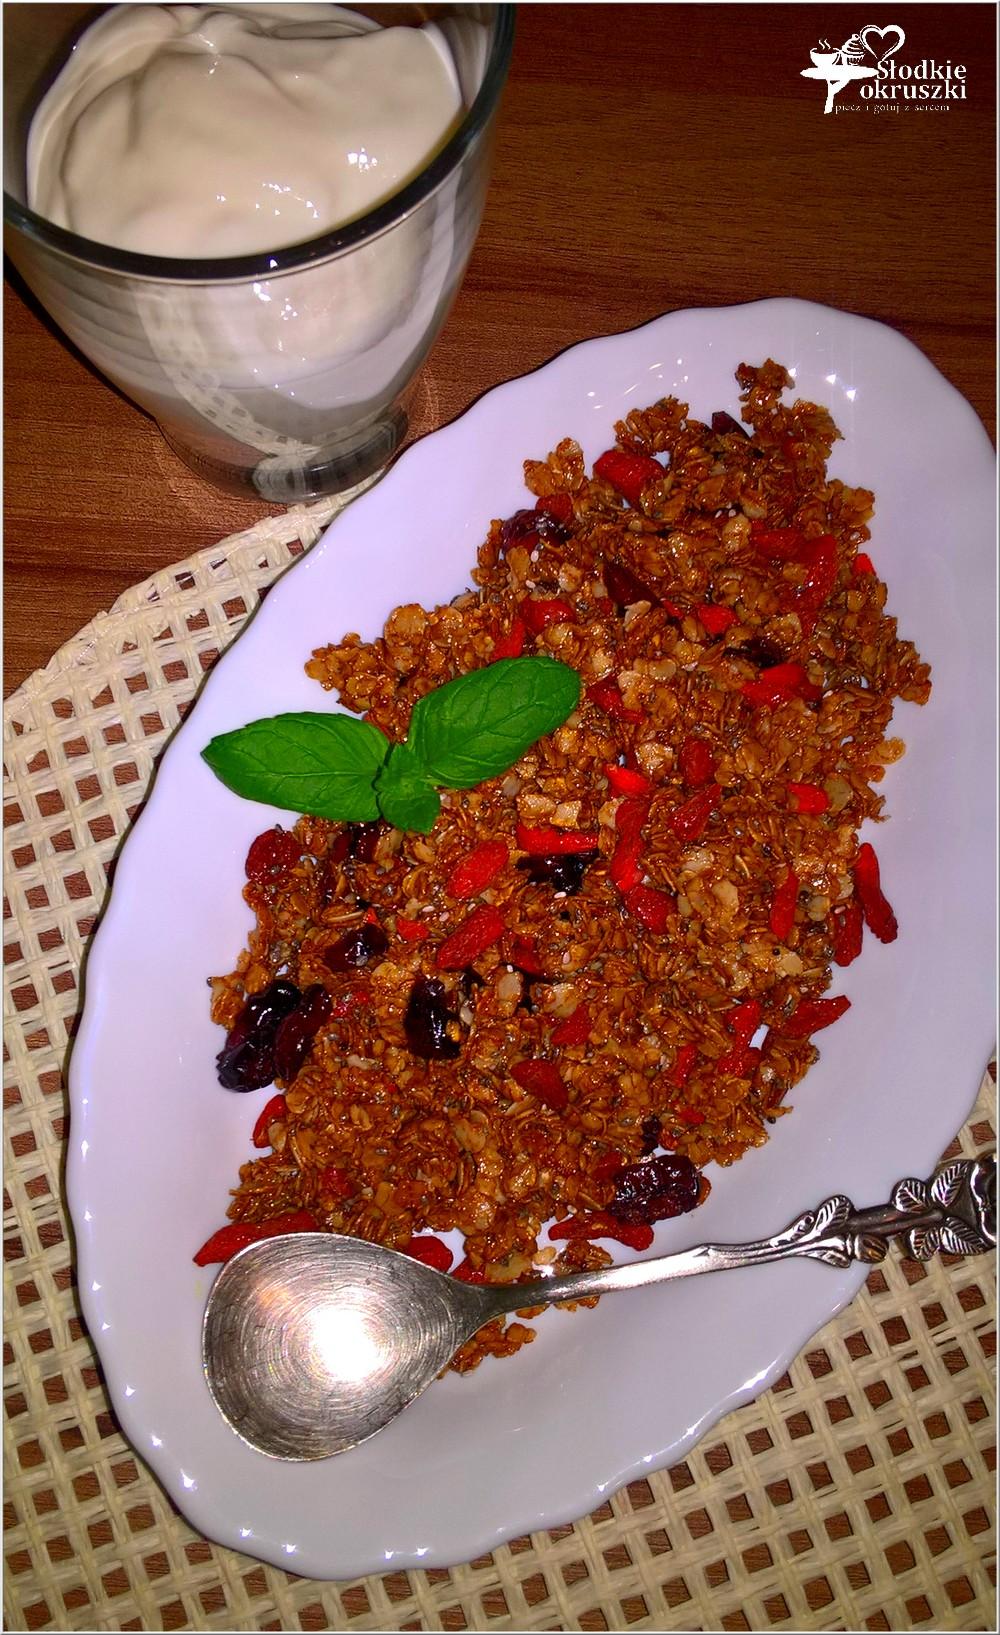 domowa-granola-z-melasa-i-jagodami-goji-1